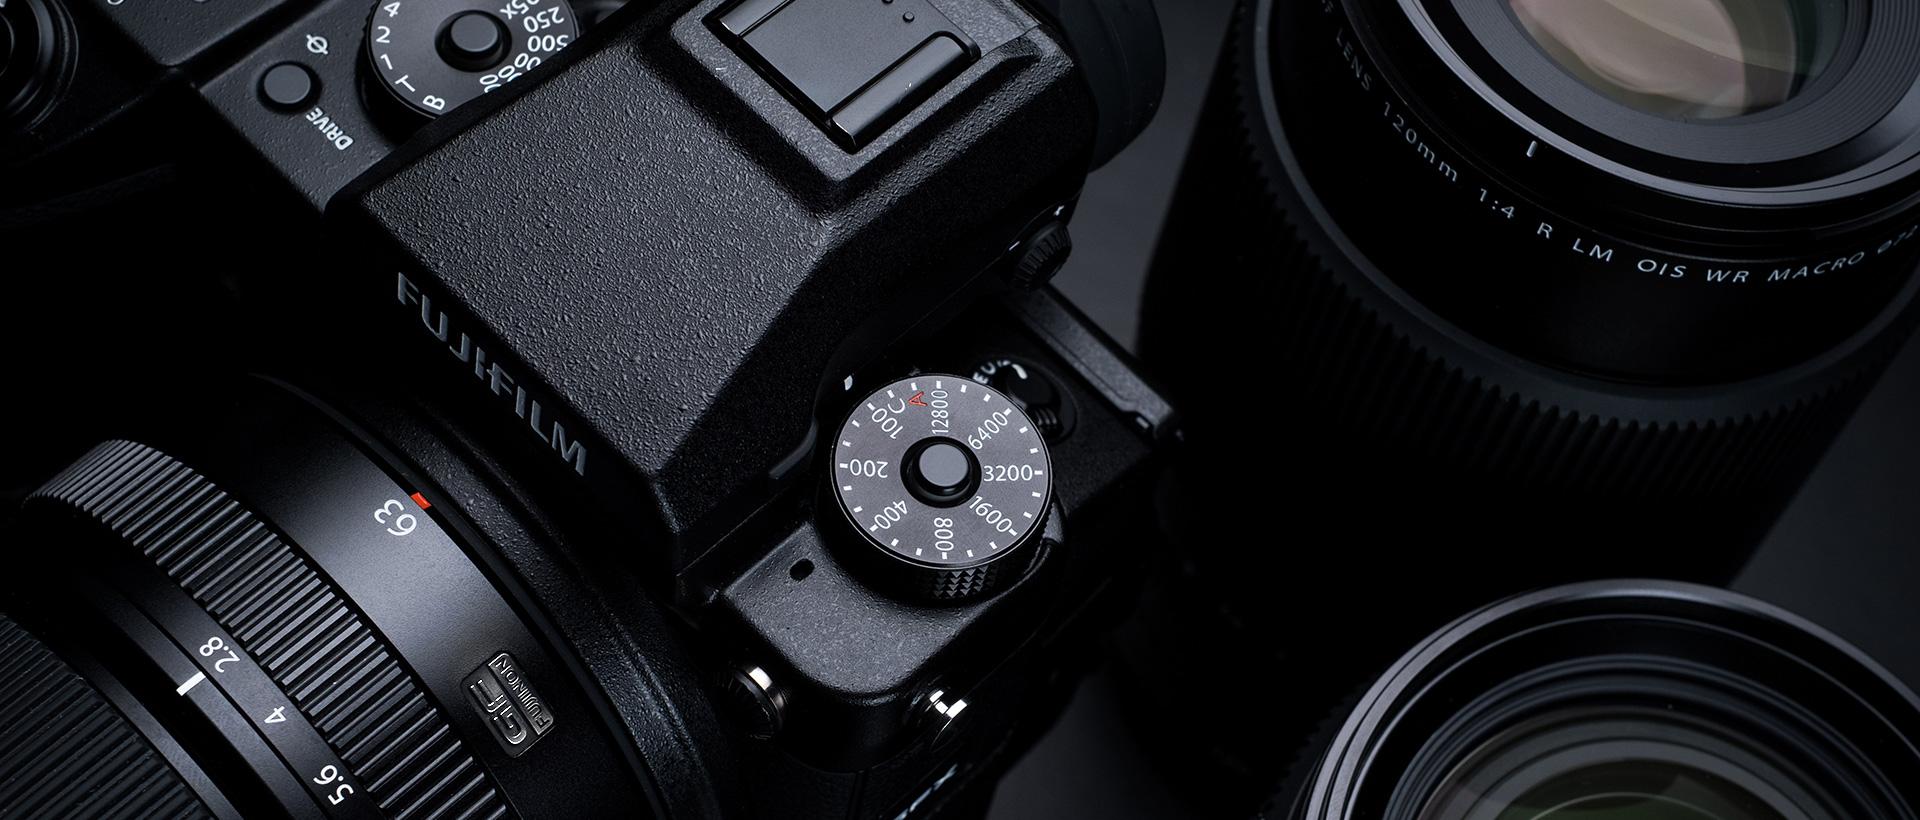 Fujifilm GFX Mittelformat @ Photohaus.de